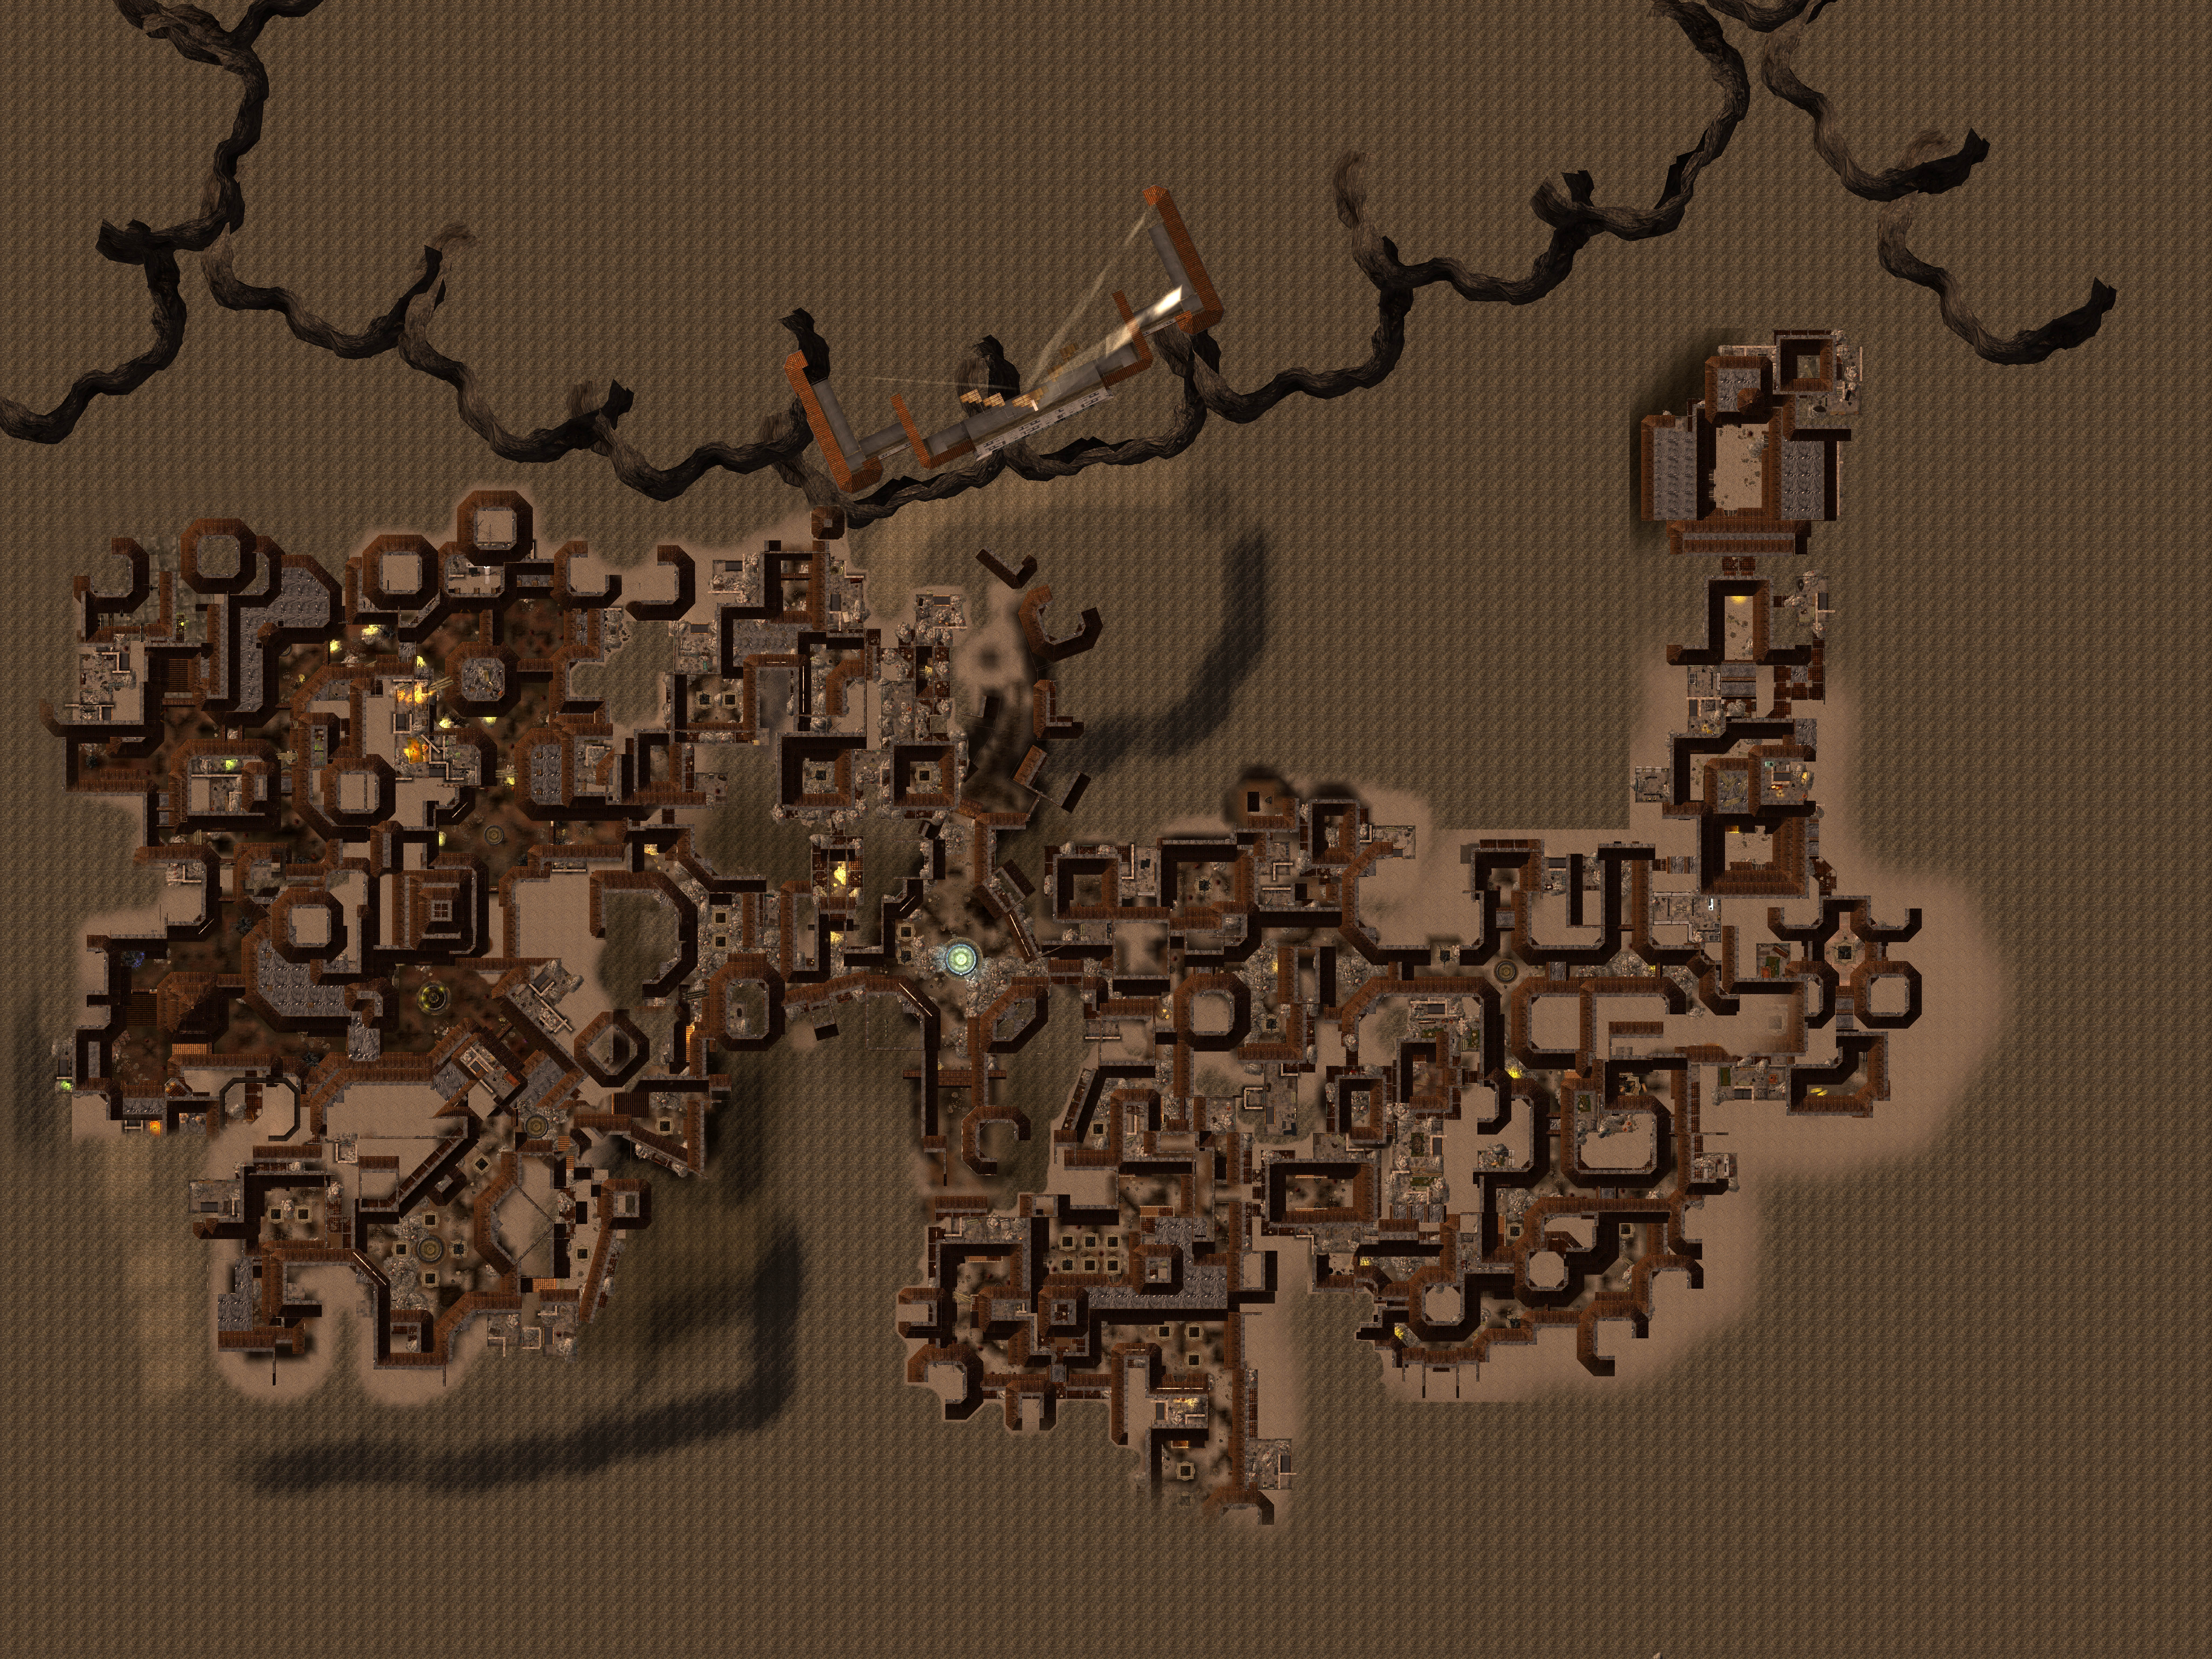 Fallout: New Vegas map | Fallout Wiki | FANDOM powered by Wikia